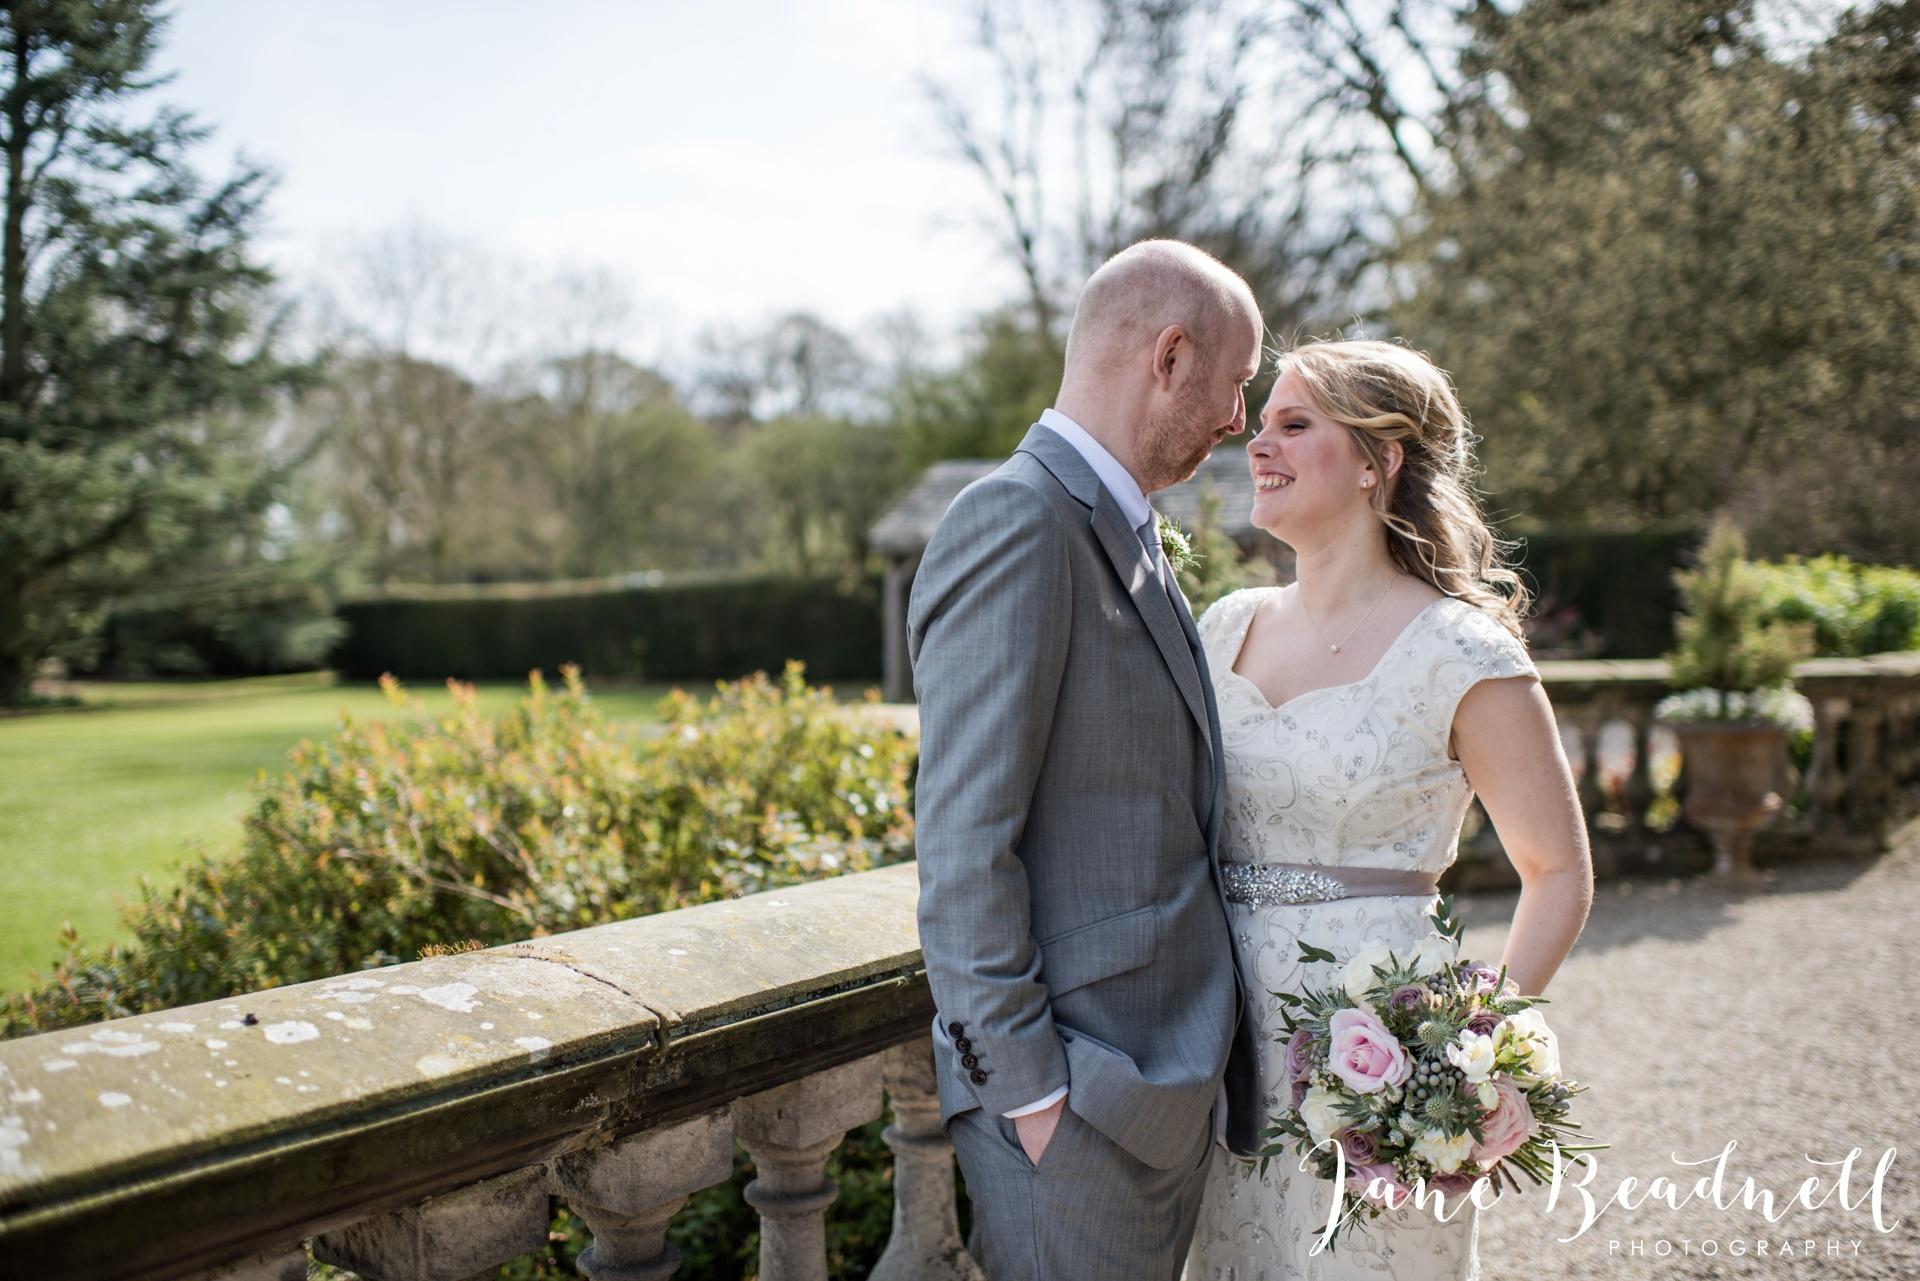 Middleton Lodge wedding photography by fine art wedding photographer Jane Beadnell_0049